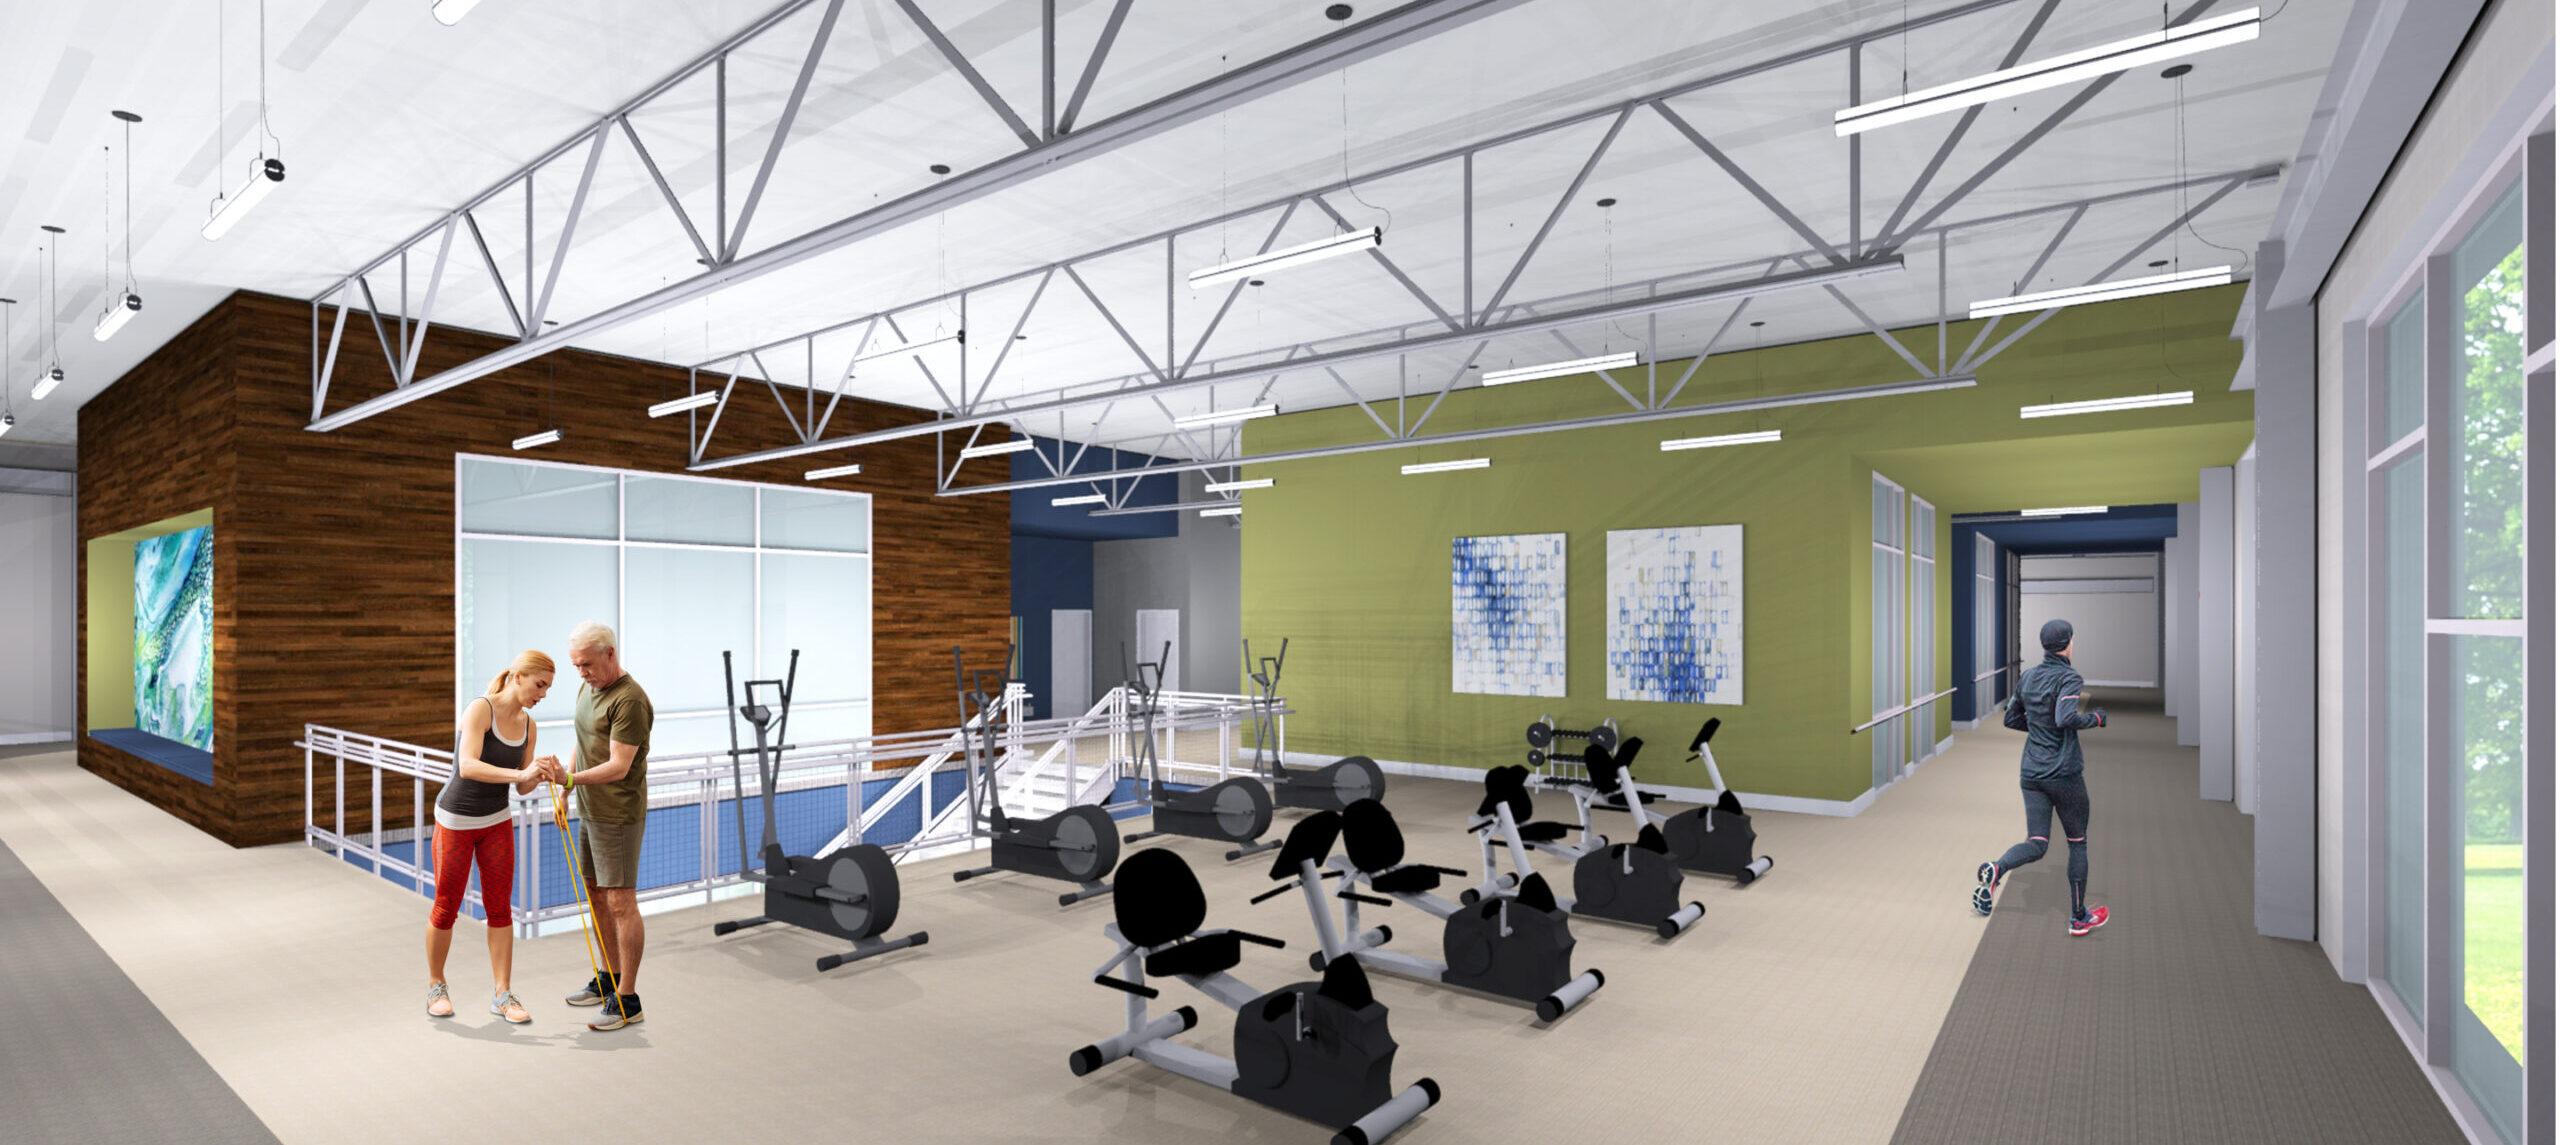 Glenaire Wellness Center Fitness Equipment